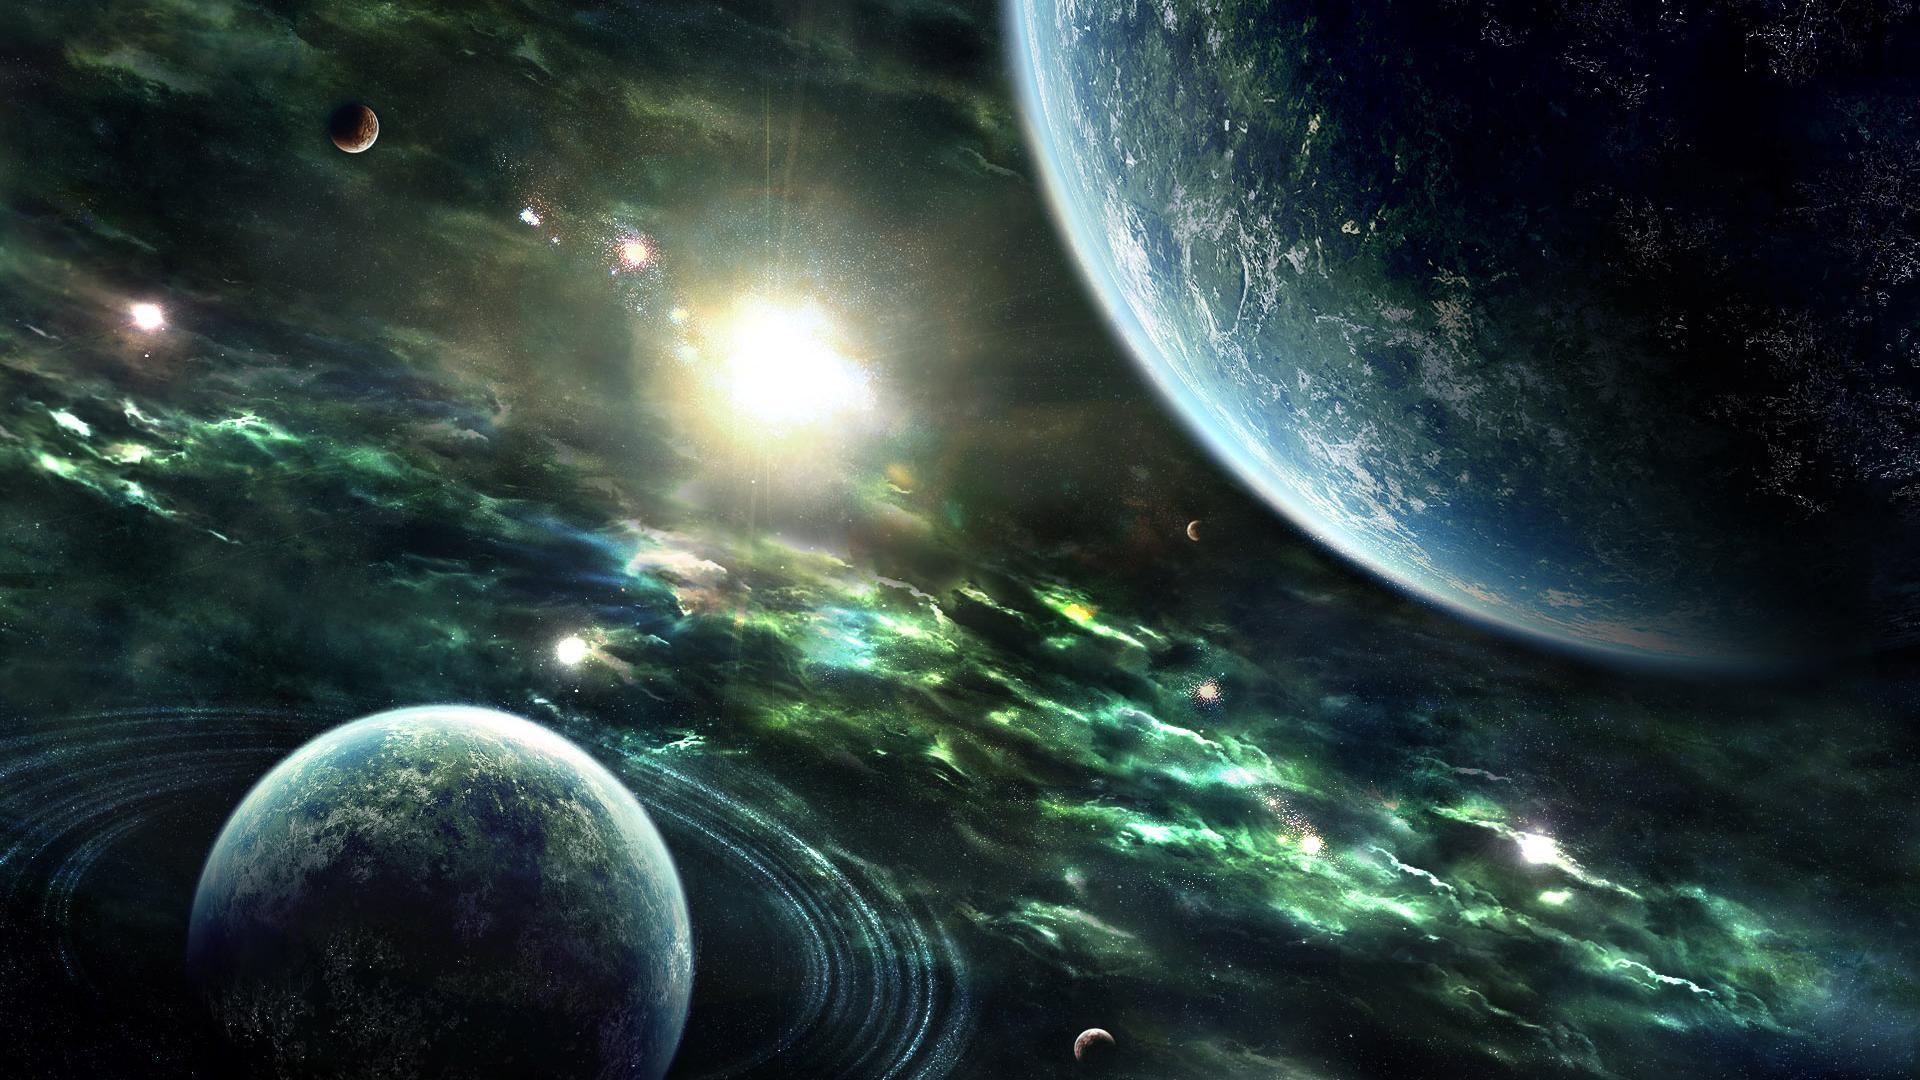 HD Space Wallpaper Widescreen - WallpaperSafari